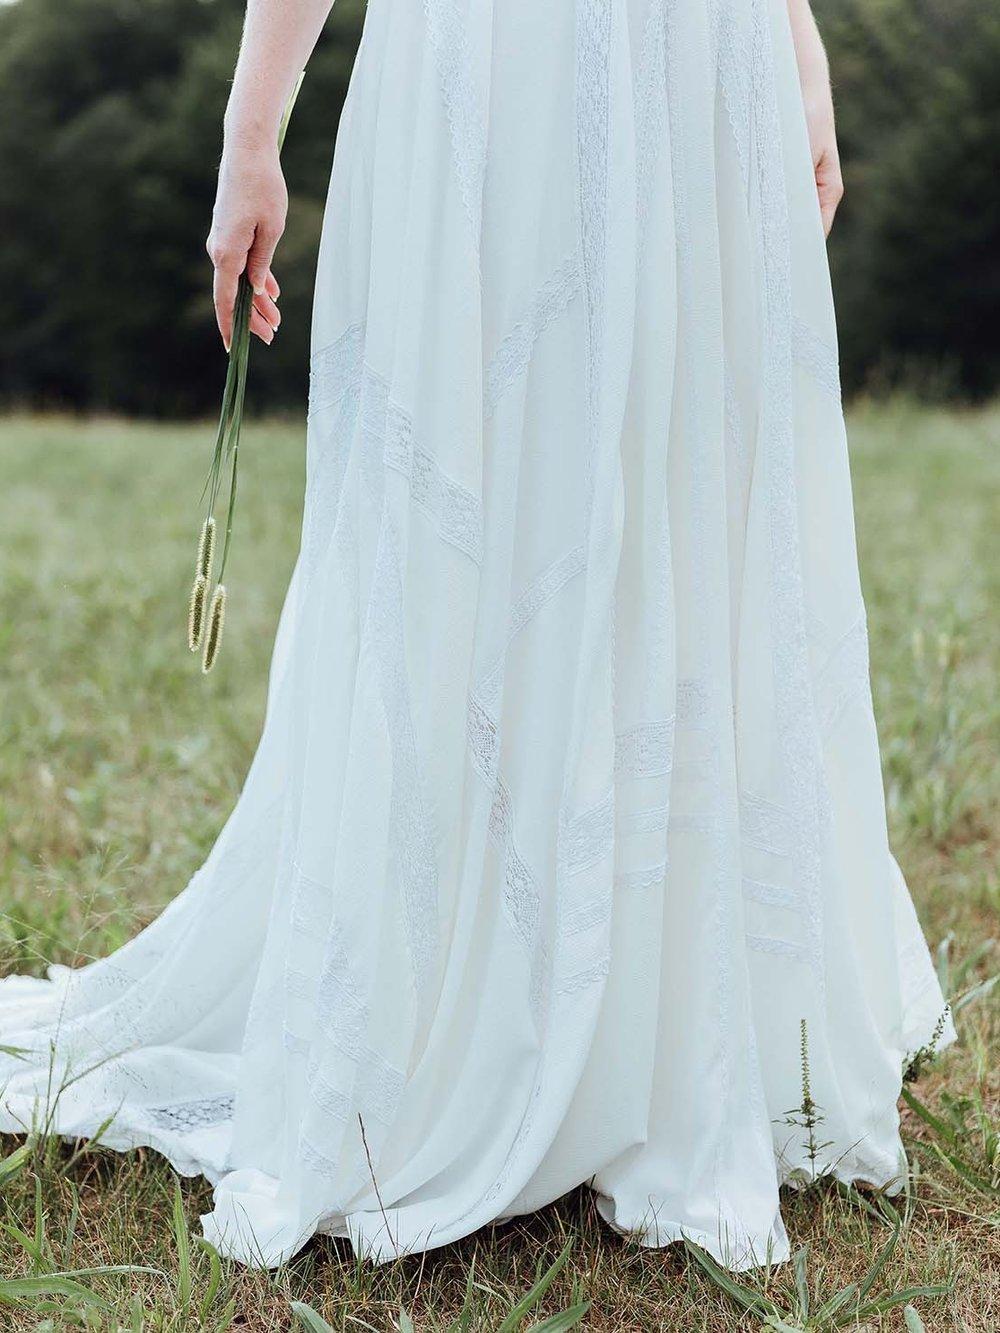 WSPCo-Gather-Greene-Rebecca-Schoneveld-Bridal_geometric_lace_wedding_gown_boho_lace.jpg